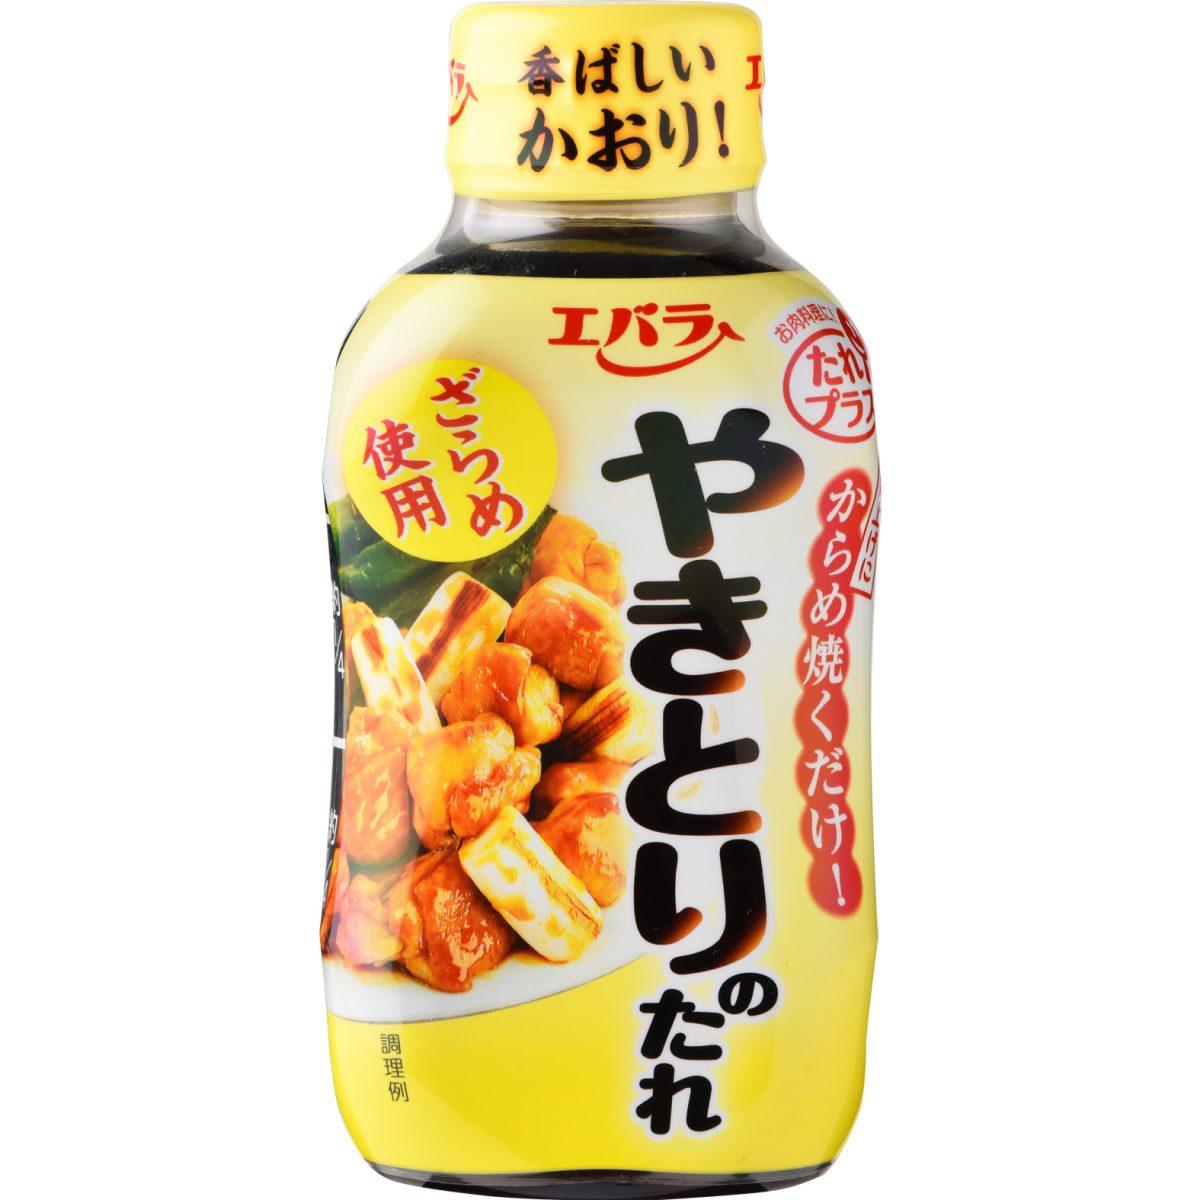 Sauce of Yakitori